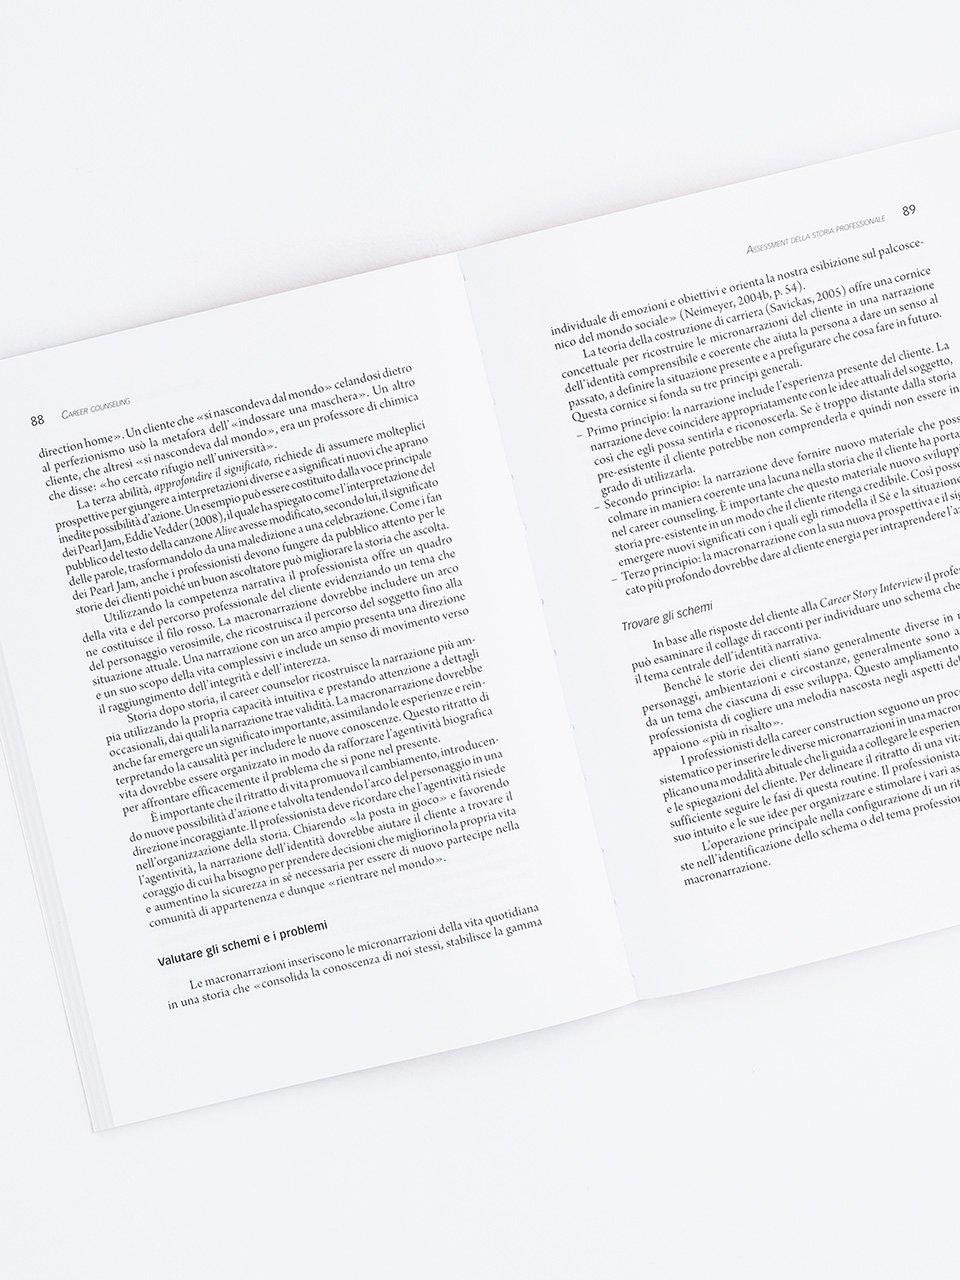 Career counseling - Libri - Erickson 2